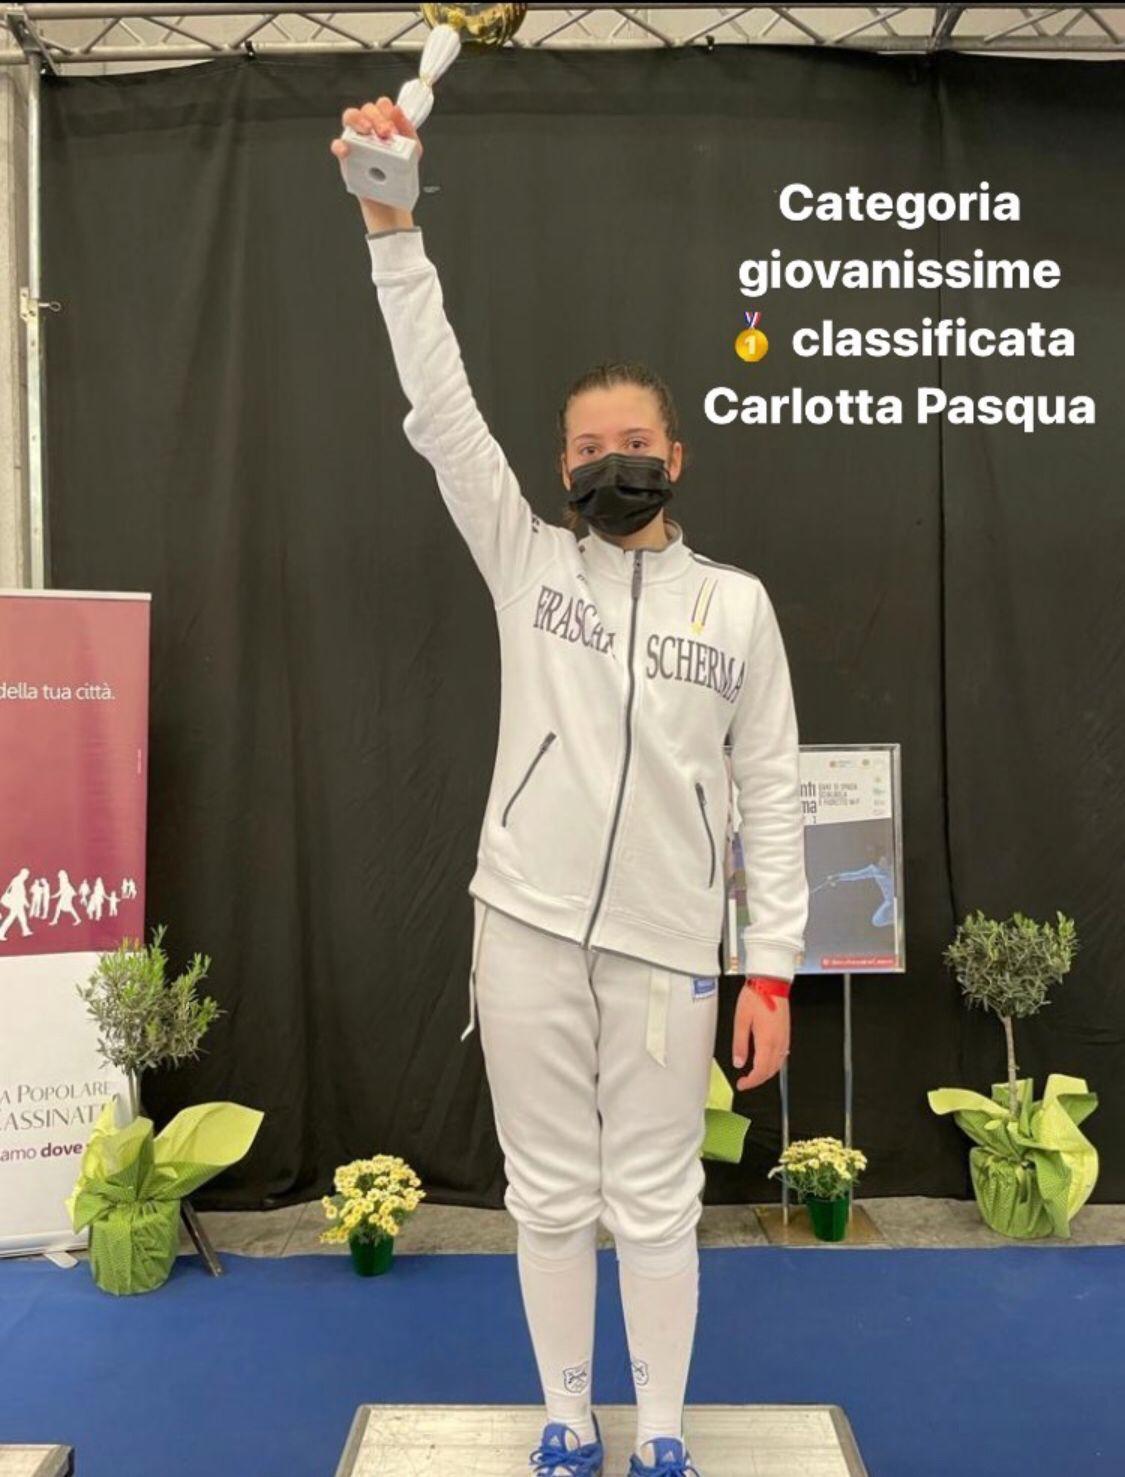 Carlotta Pasqua